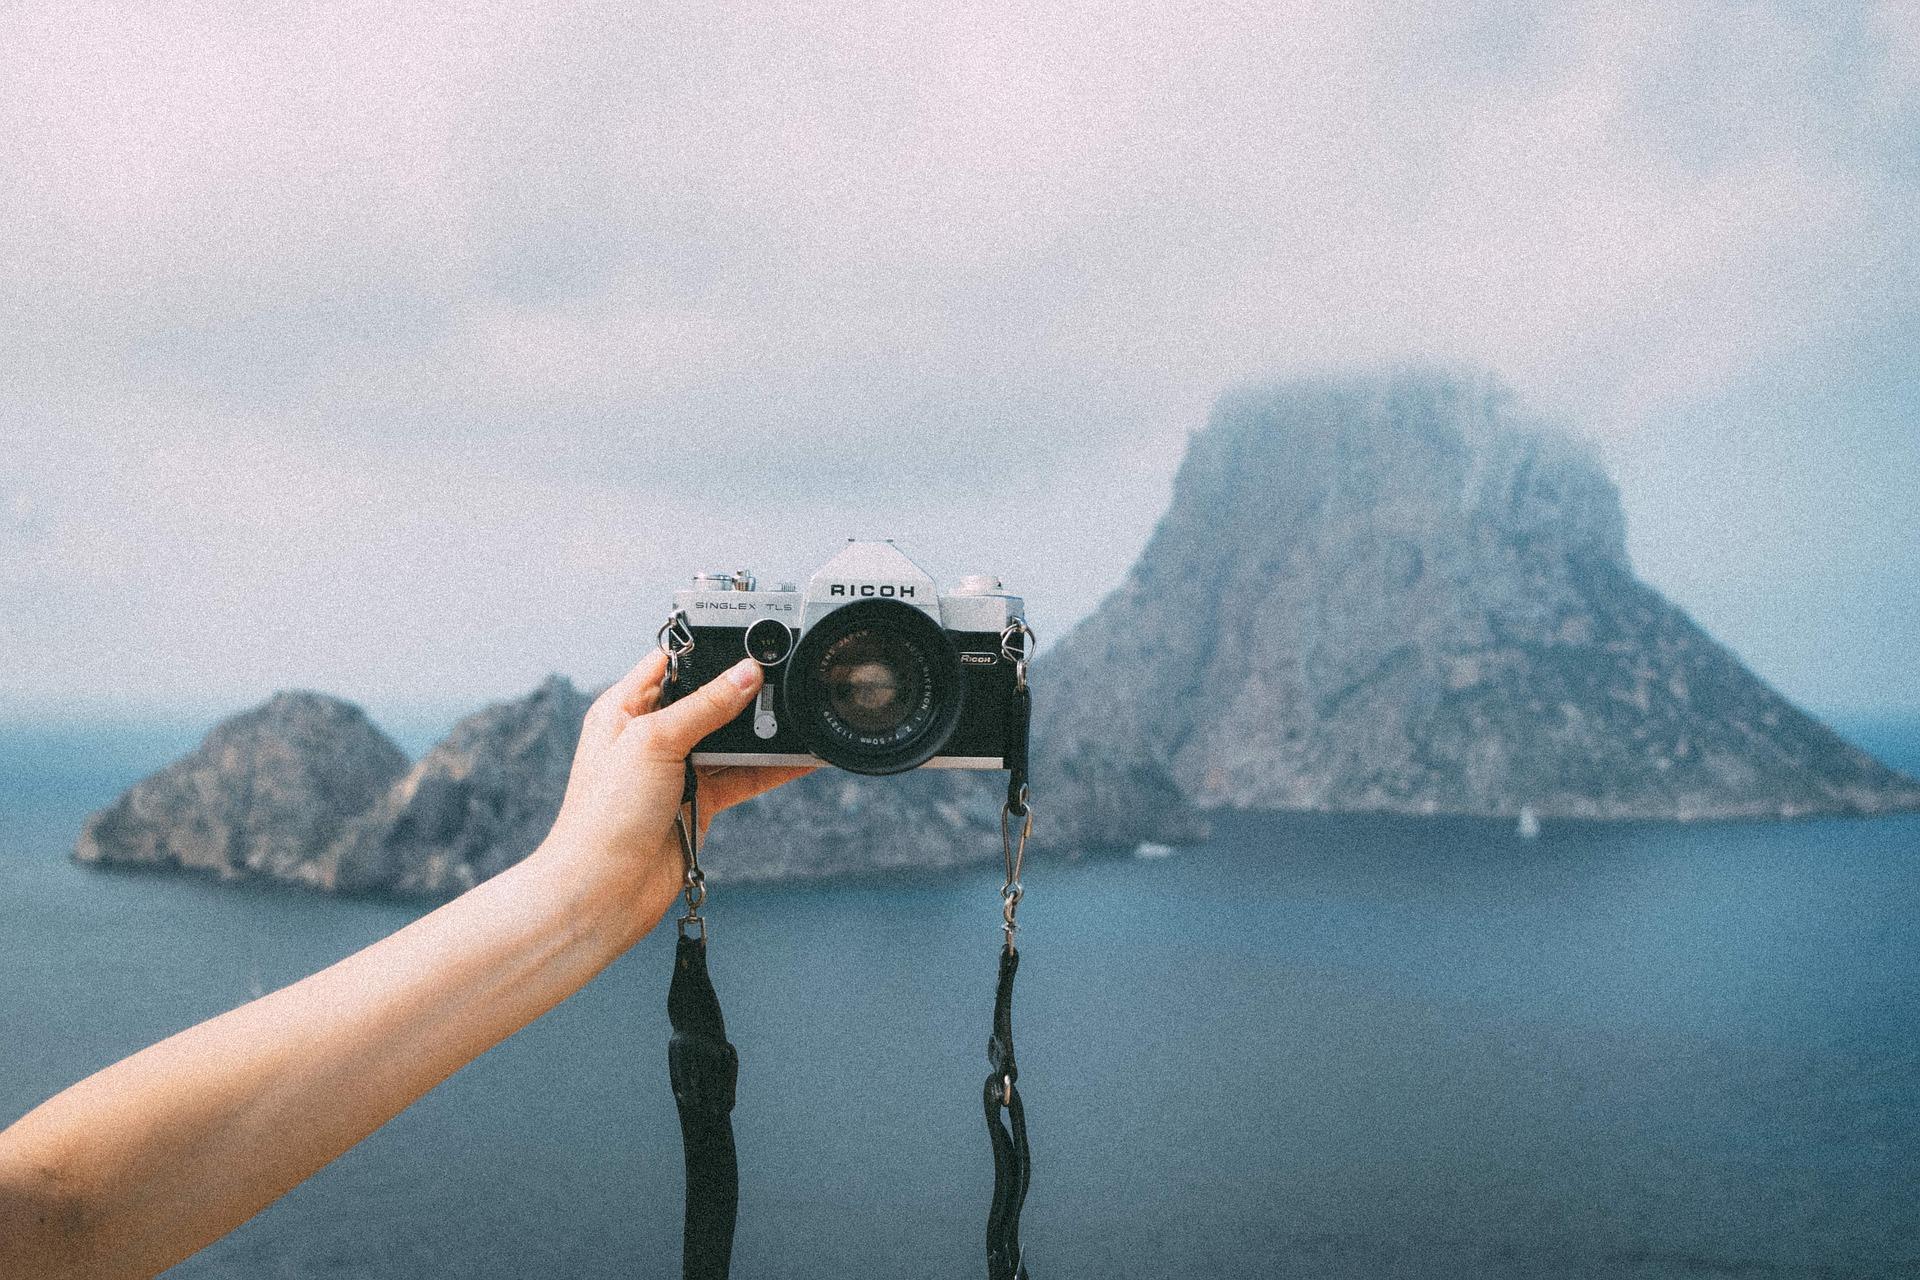 Selfies and Self-portraits - Credits: Pixabay.com (Stocksnap)